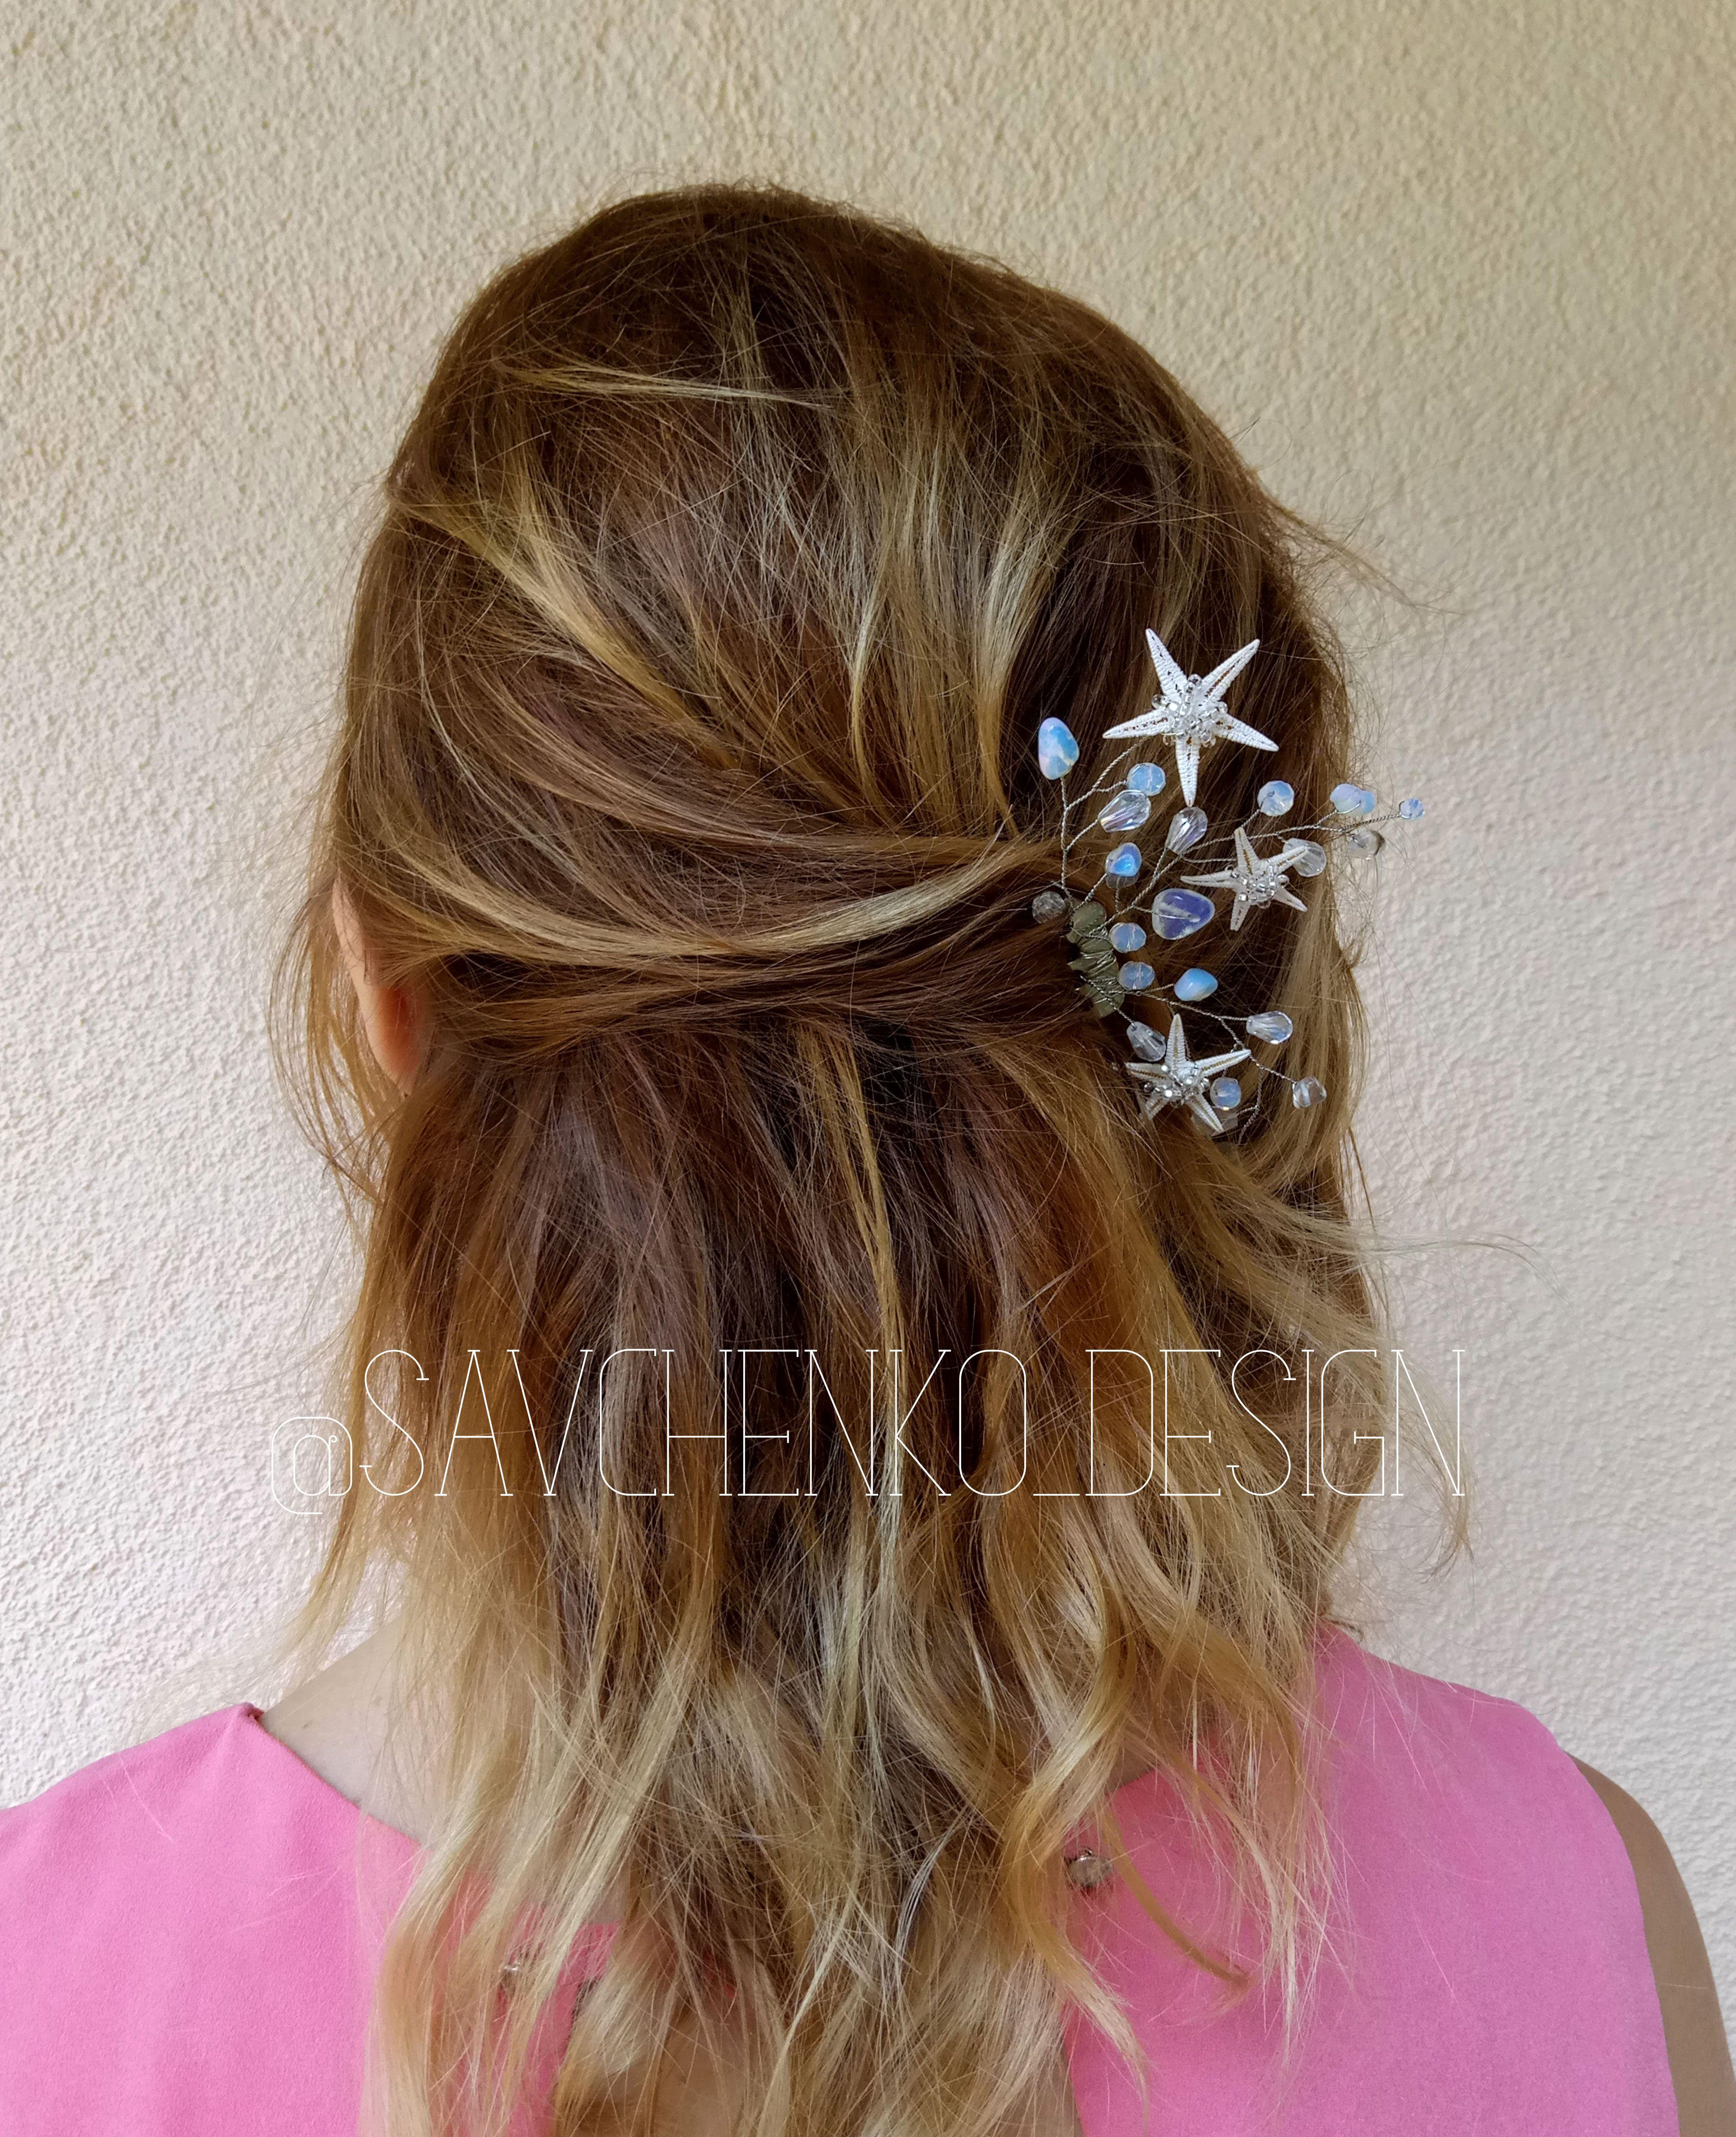 Starfish Hair Clip Aqua Blue Starfish Headpiece Starfish Hair Comb Moonstone Hair Clip Rose Gold Hair Accessories Starfish Hair Clip Starfish Hair Comb